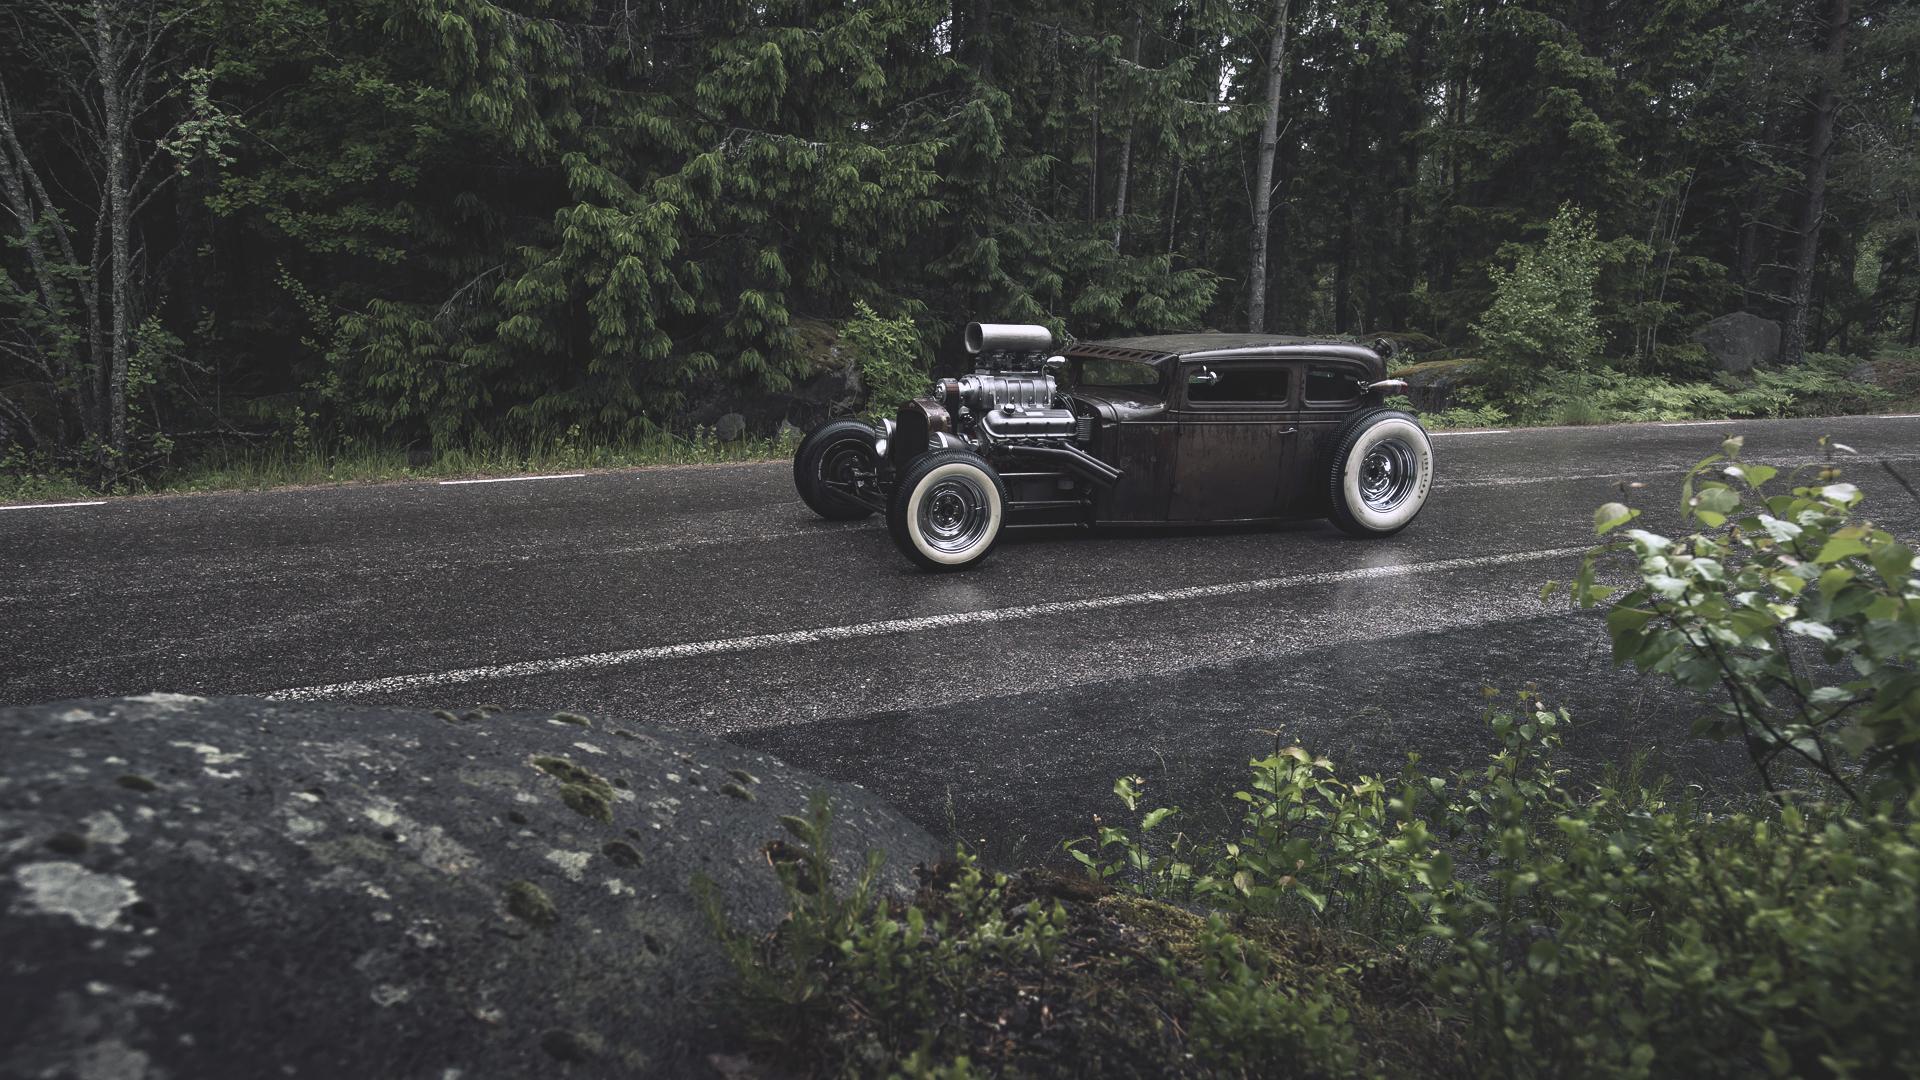 rat rod ford rat gender forest rain wallpaper photos pictures 1920x1080